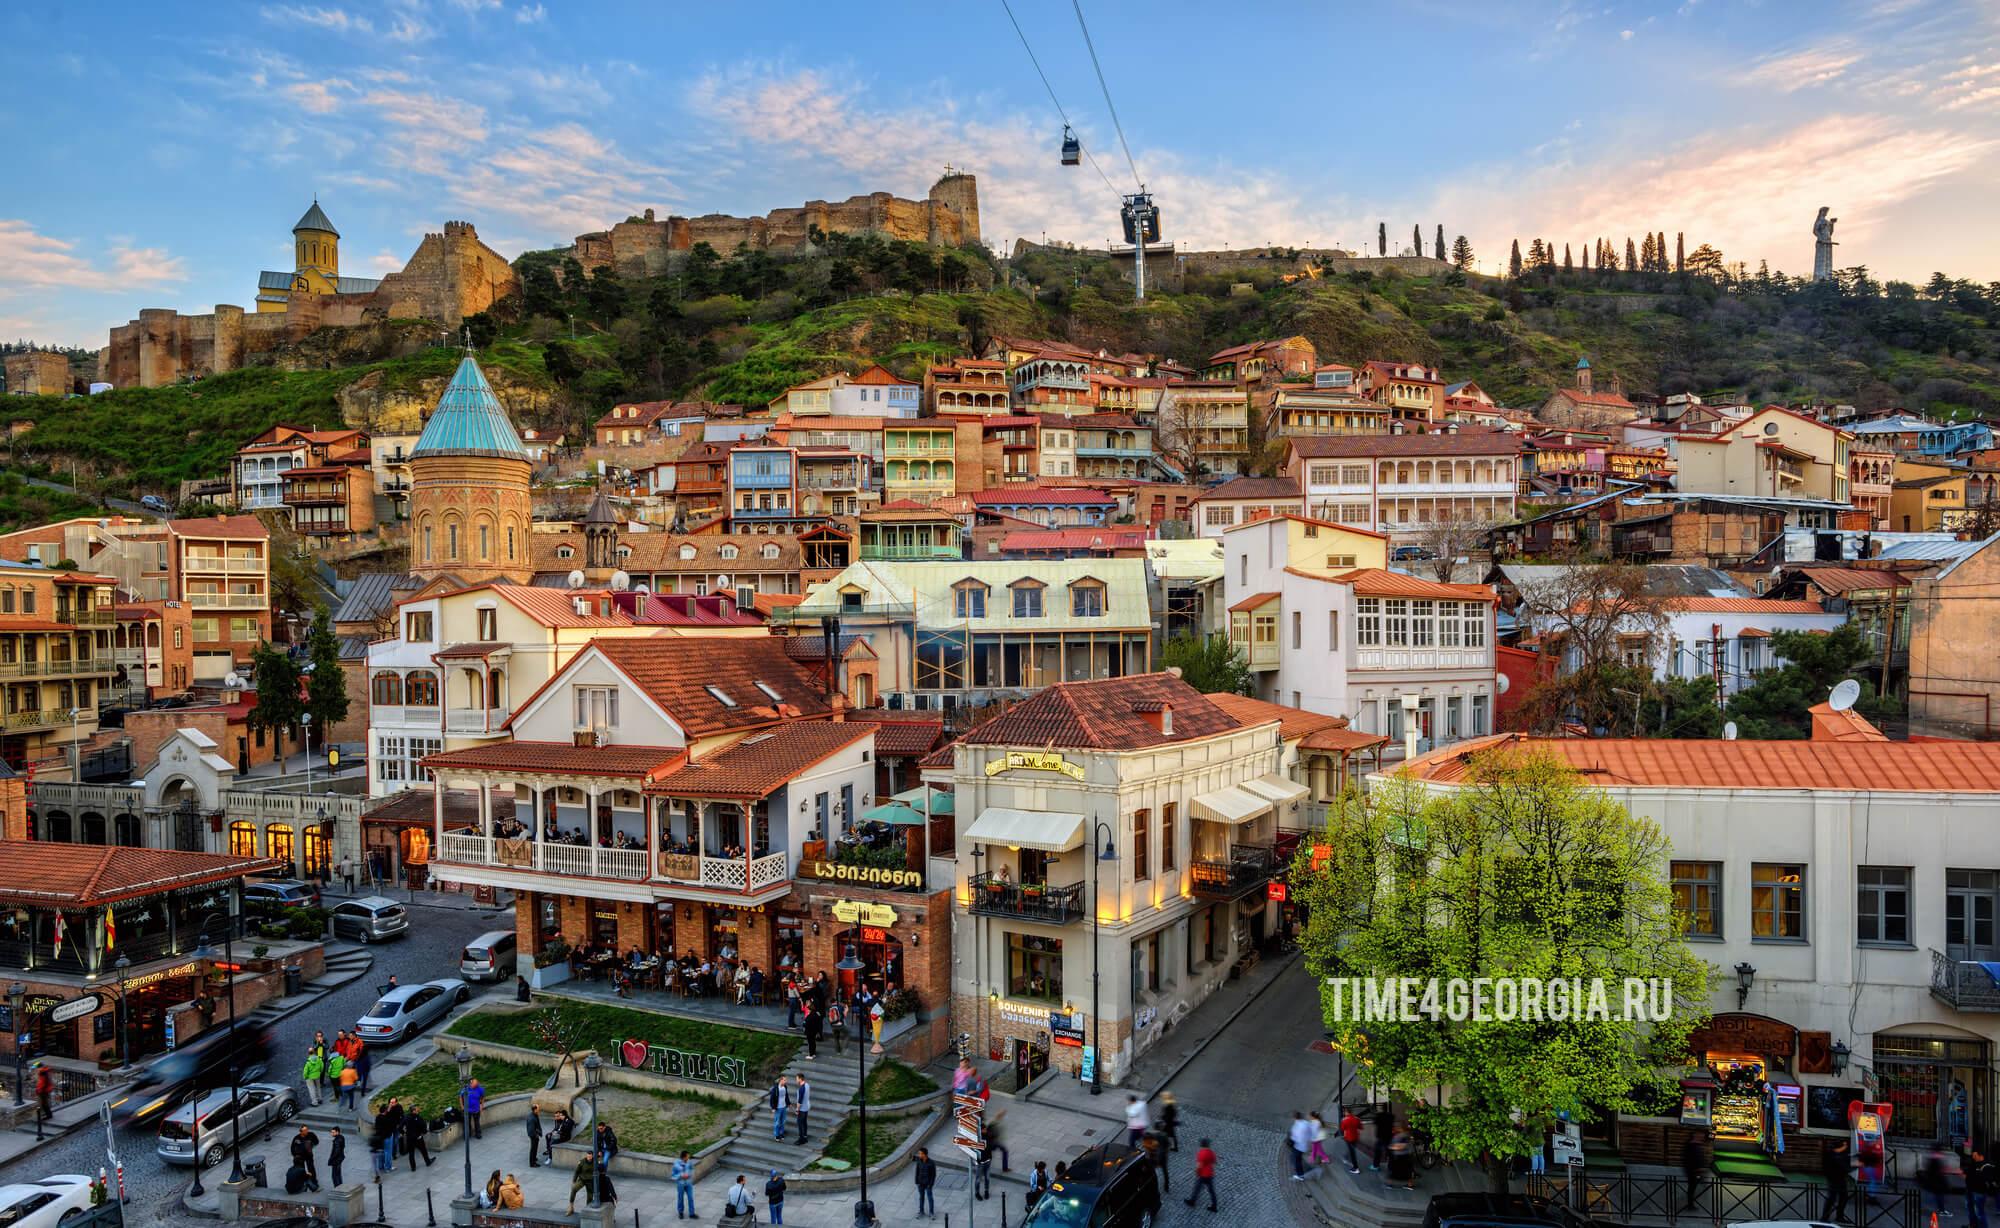 Gamarjoba Hotel, Tbilisi, Georgia